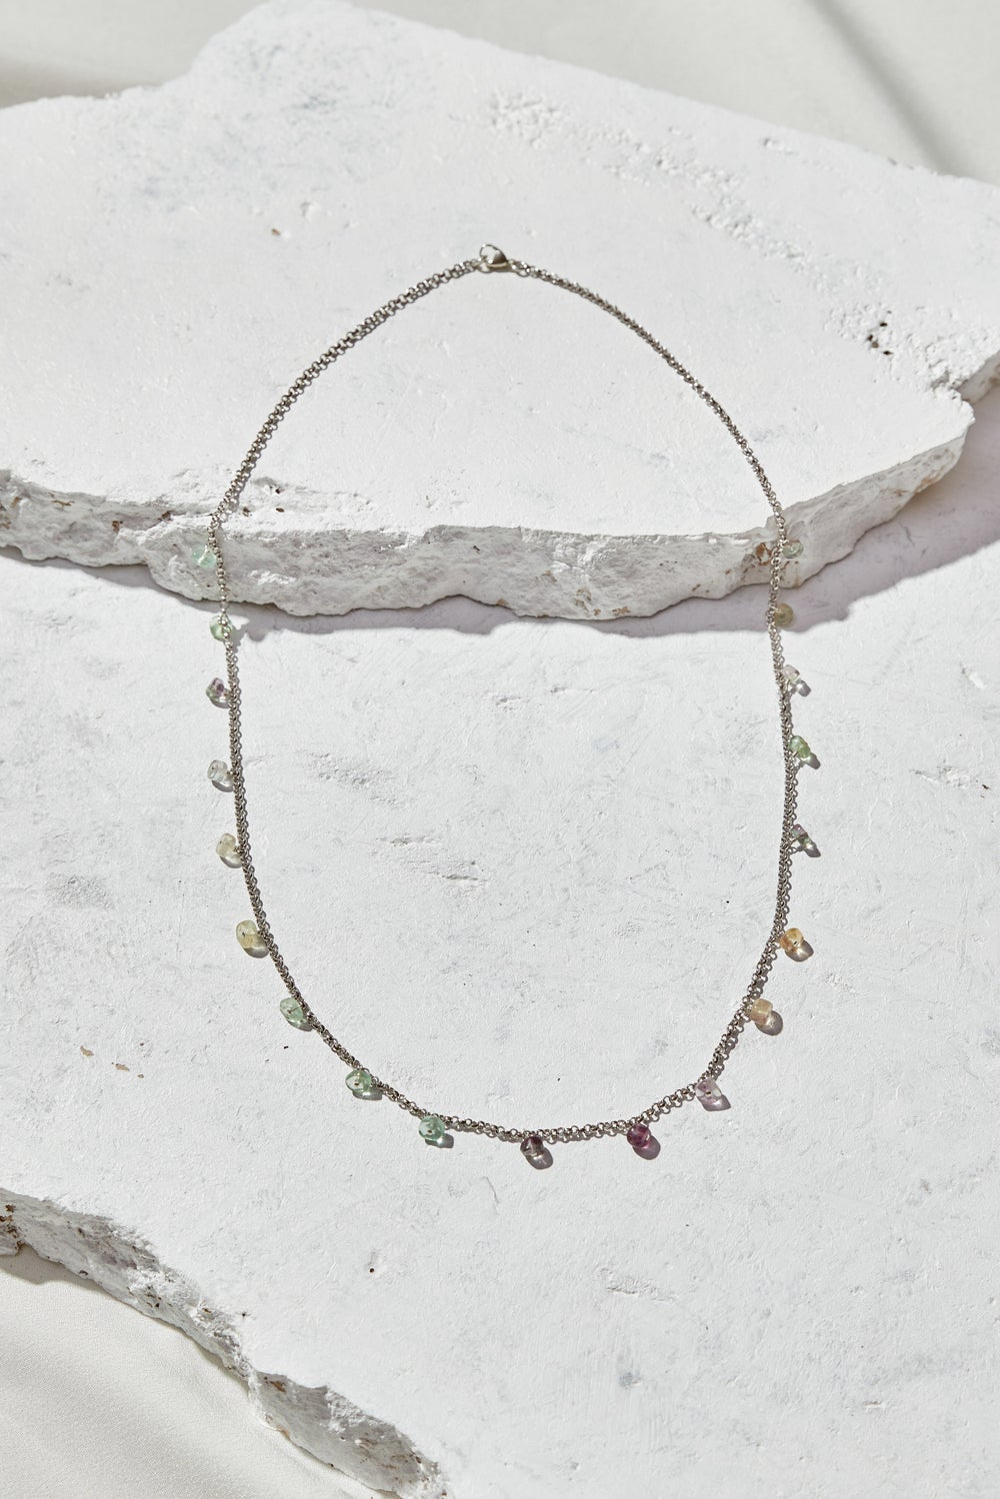 Image of Rainbow Flourite Necklace